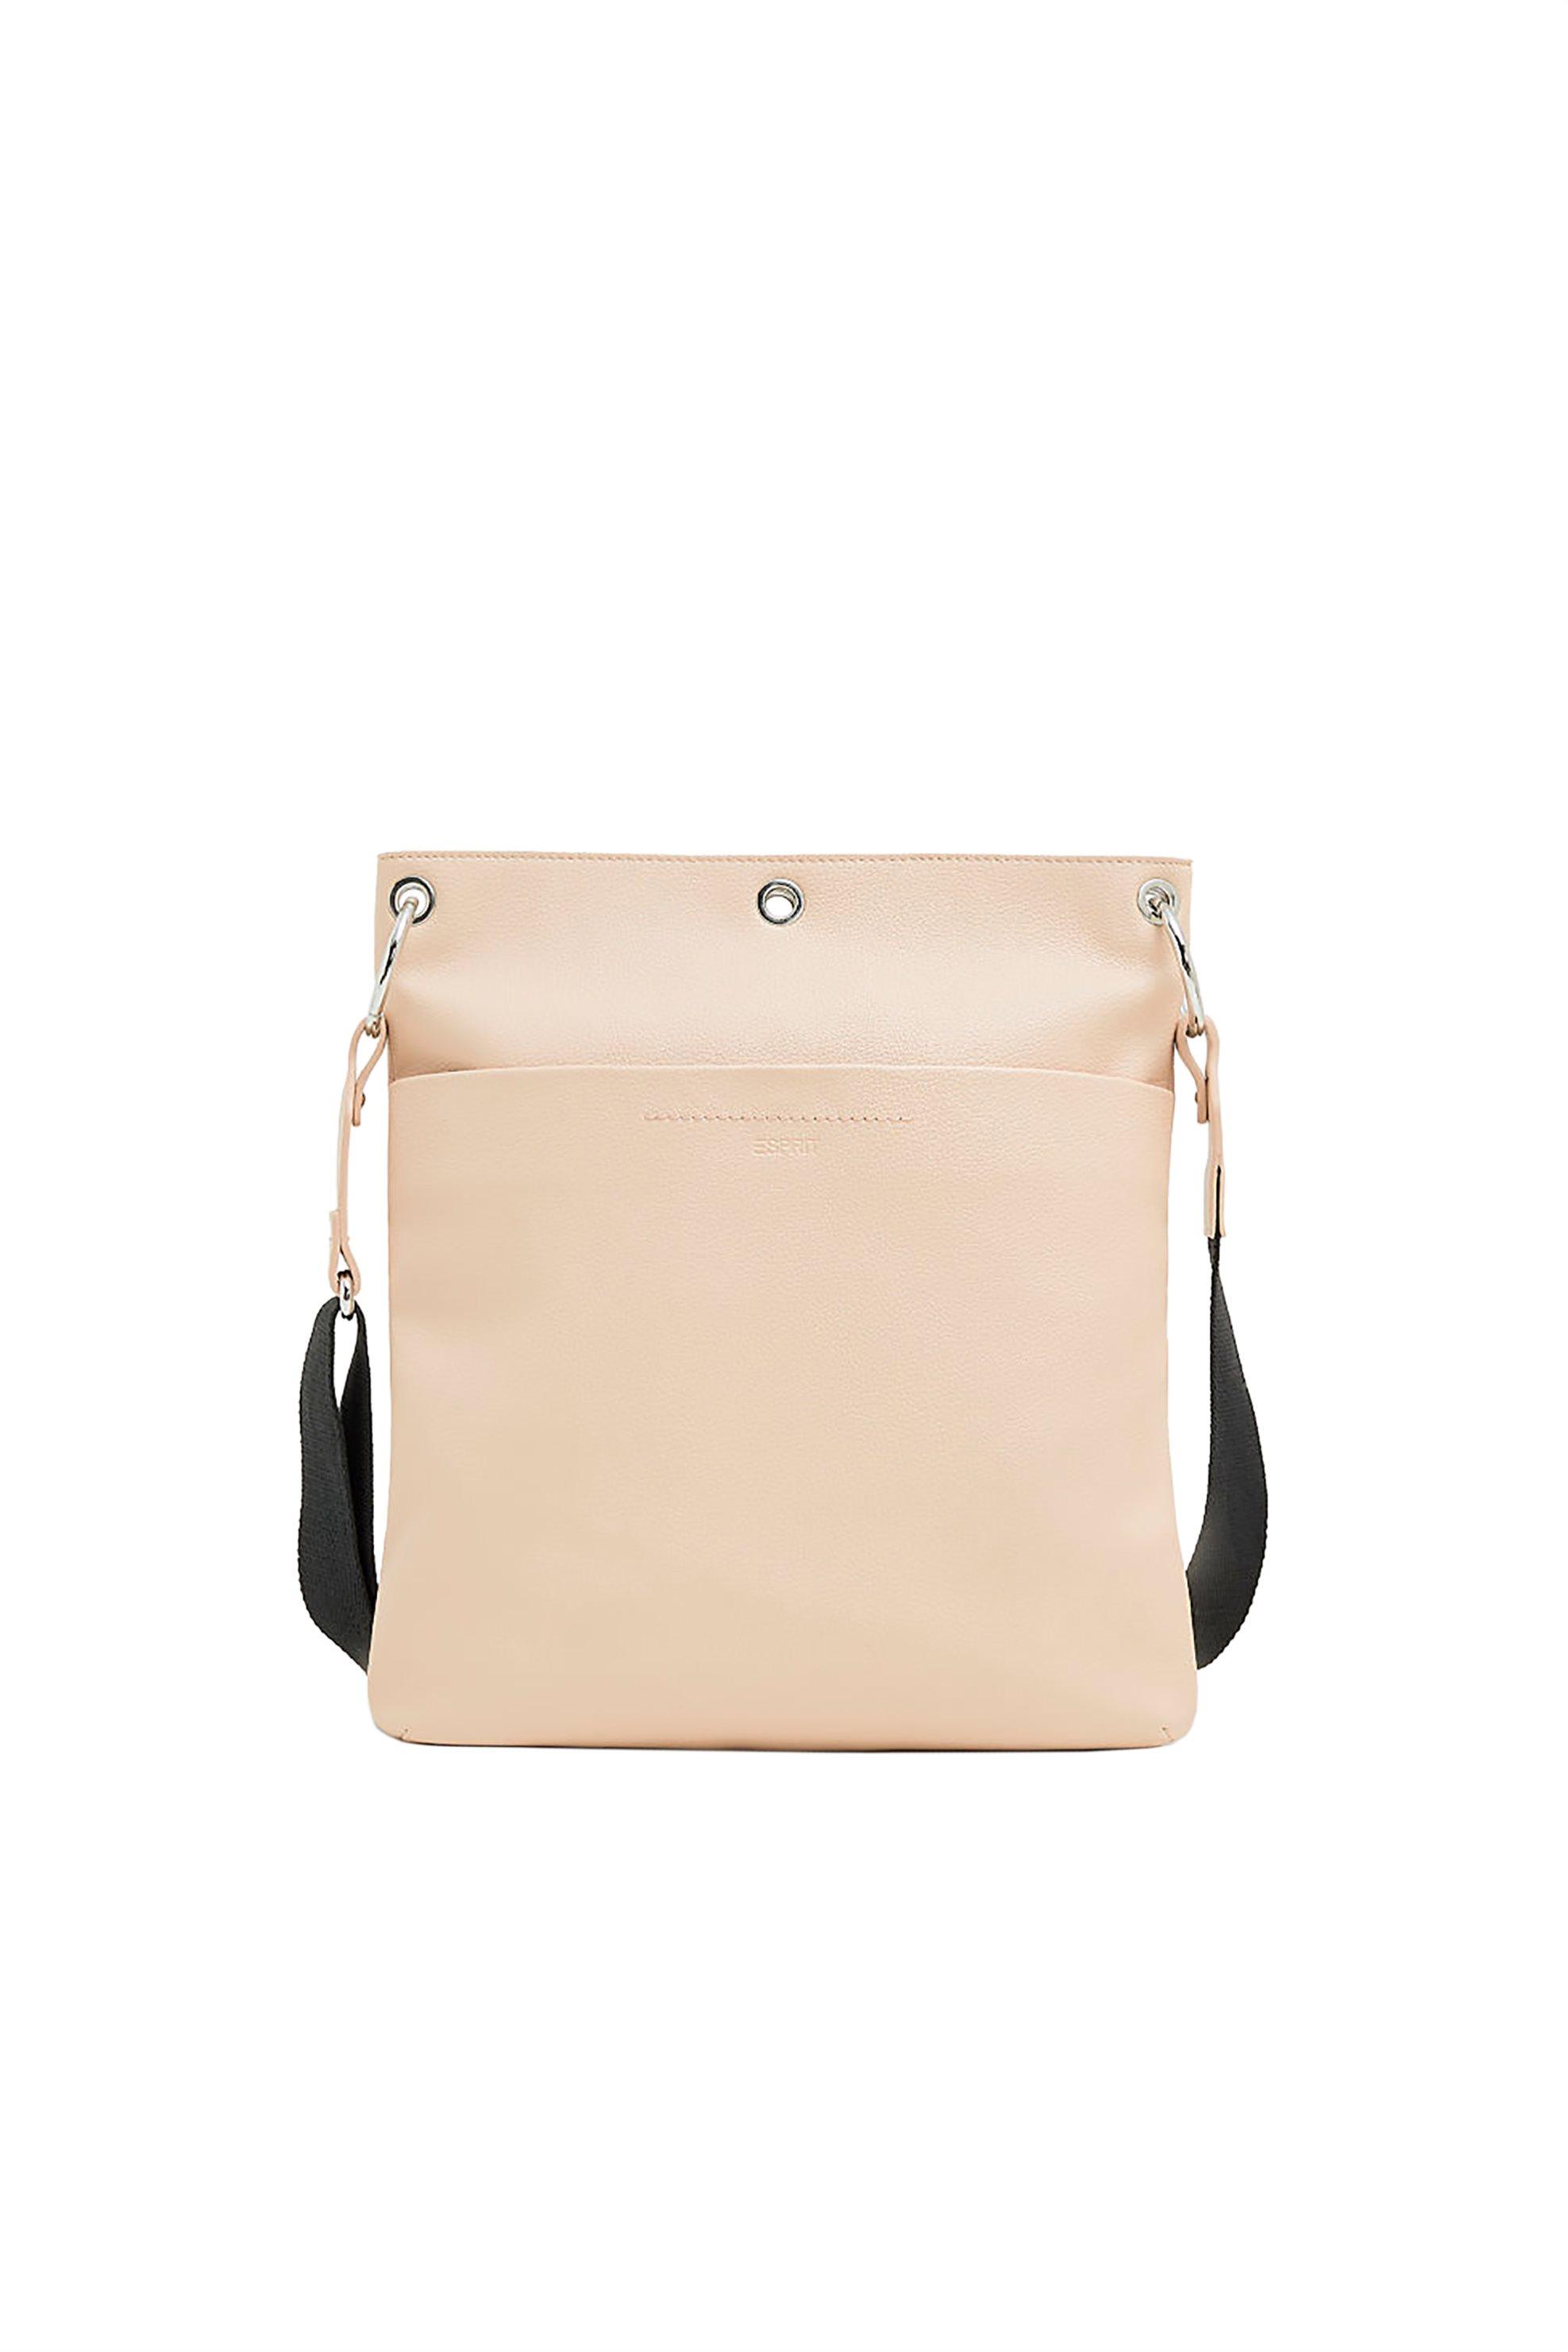 Esprit γυναικεία crossbody τσάντα με ιμάντα - 019EA1O027 - Nude γυναικα   τσαντεσ   ταχυδρόμου   cross body bags